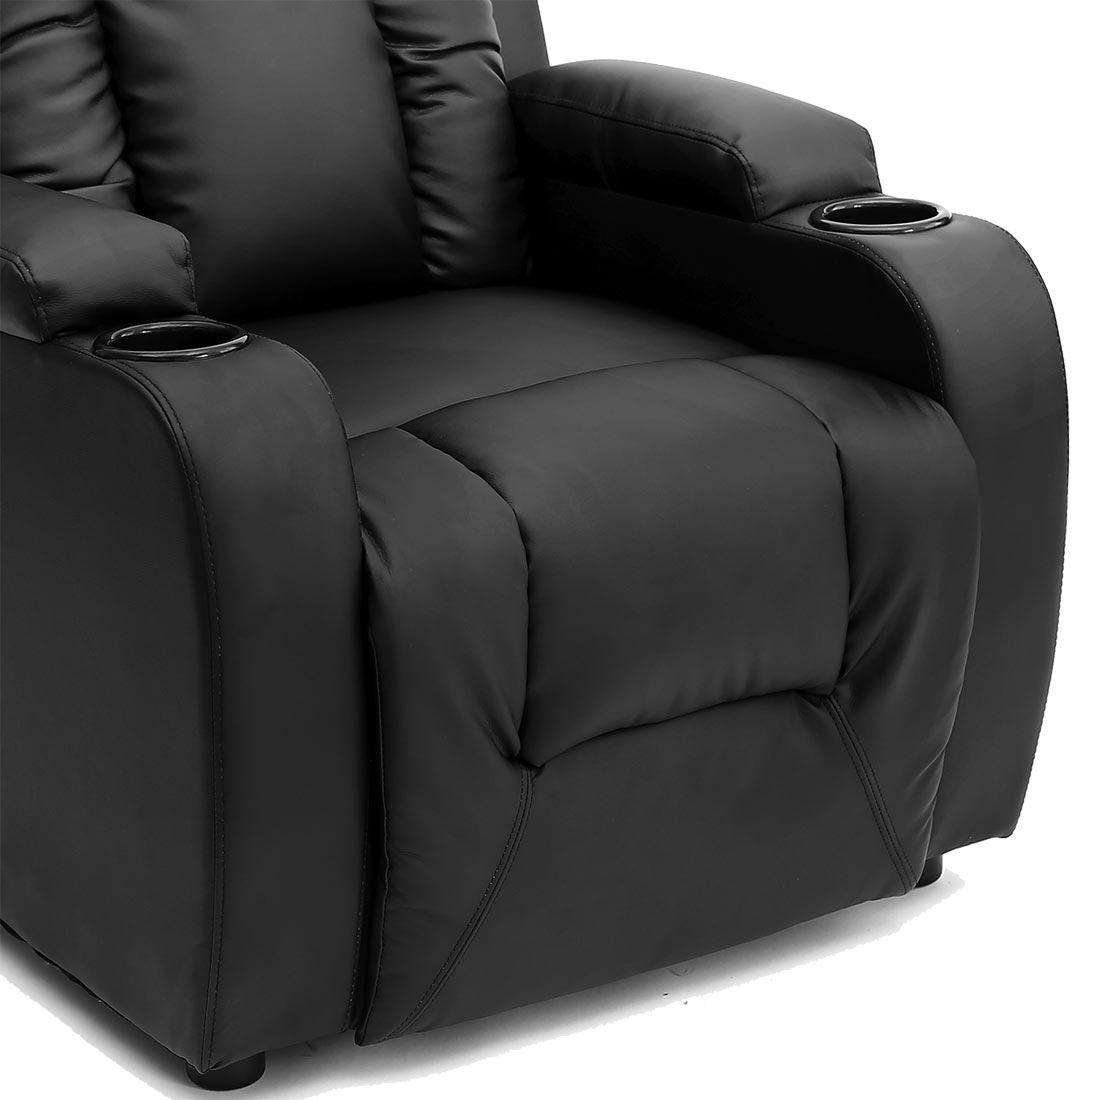 Oscar Black Leather Recliner W Drink Holders Armchair Sofa